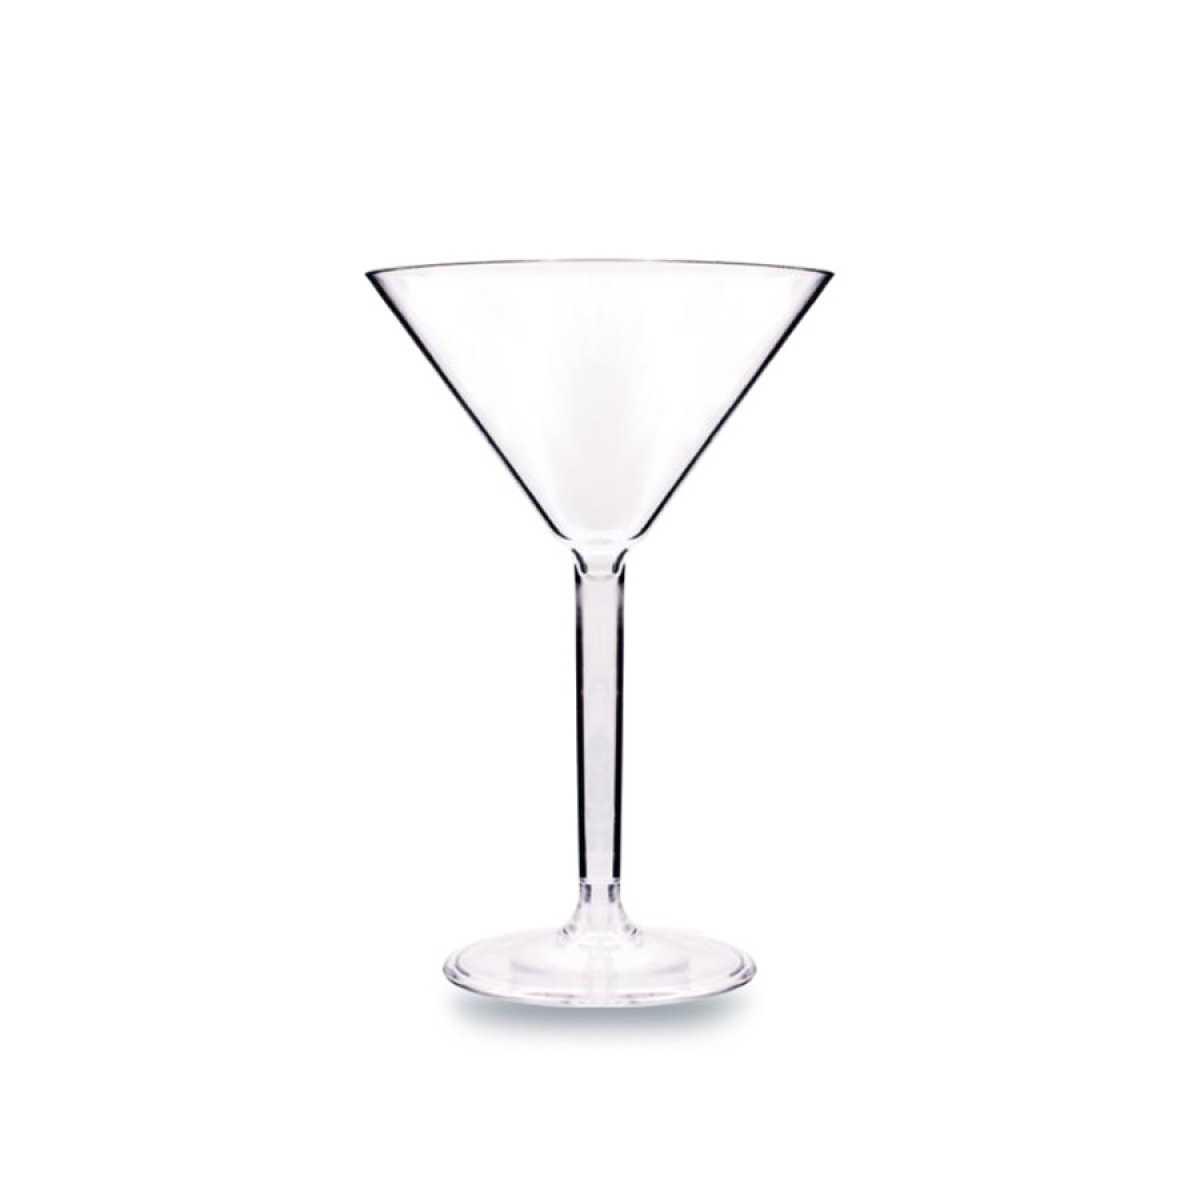 Guestinhouse Premium Martini Bardağı, 200ml